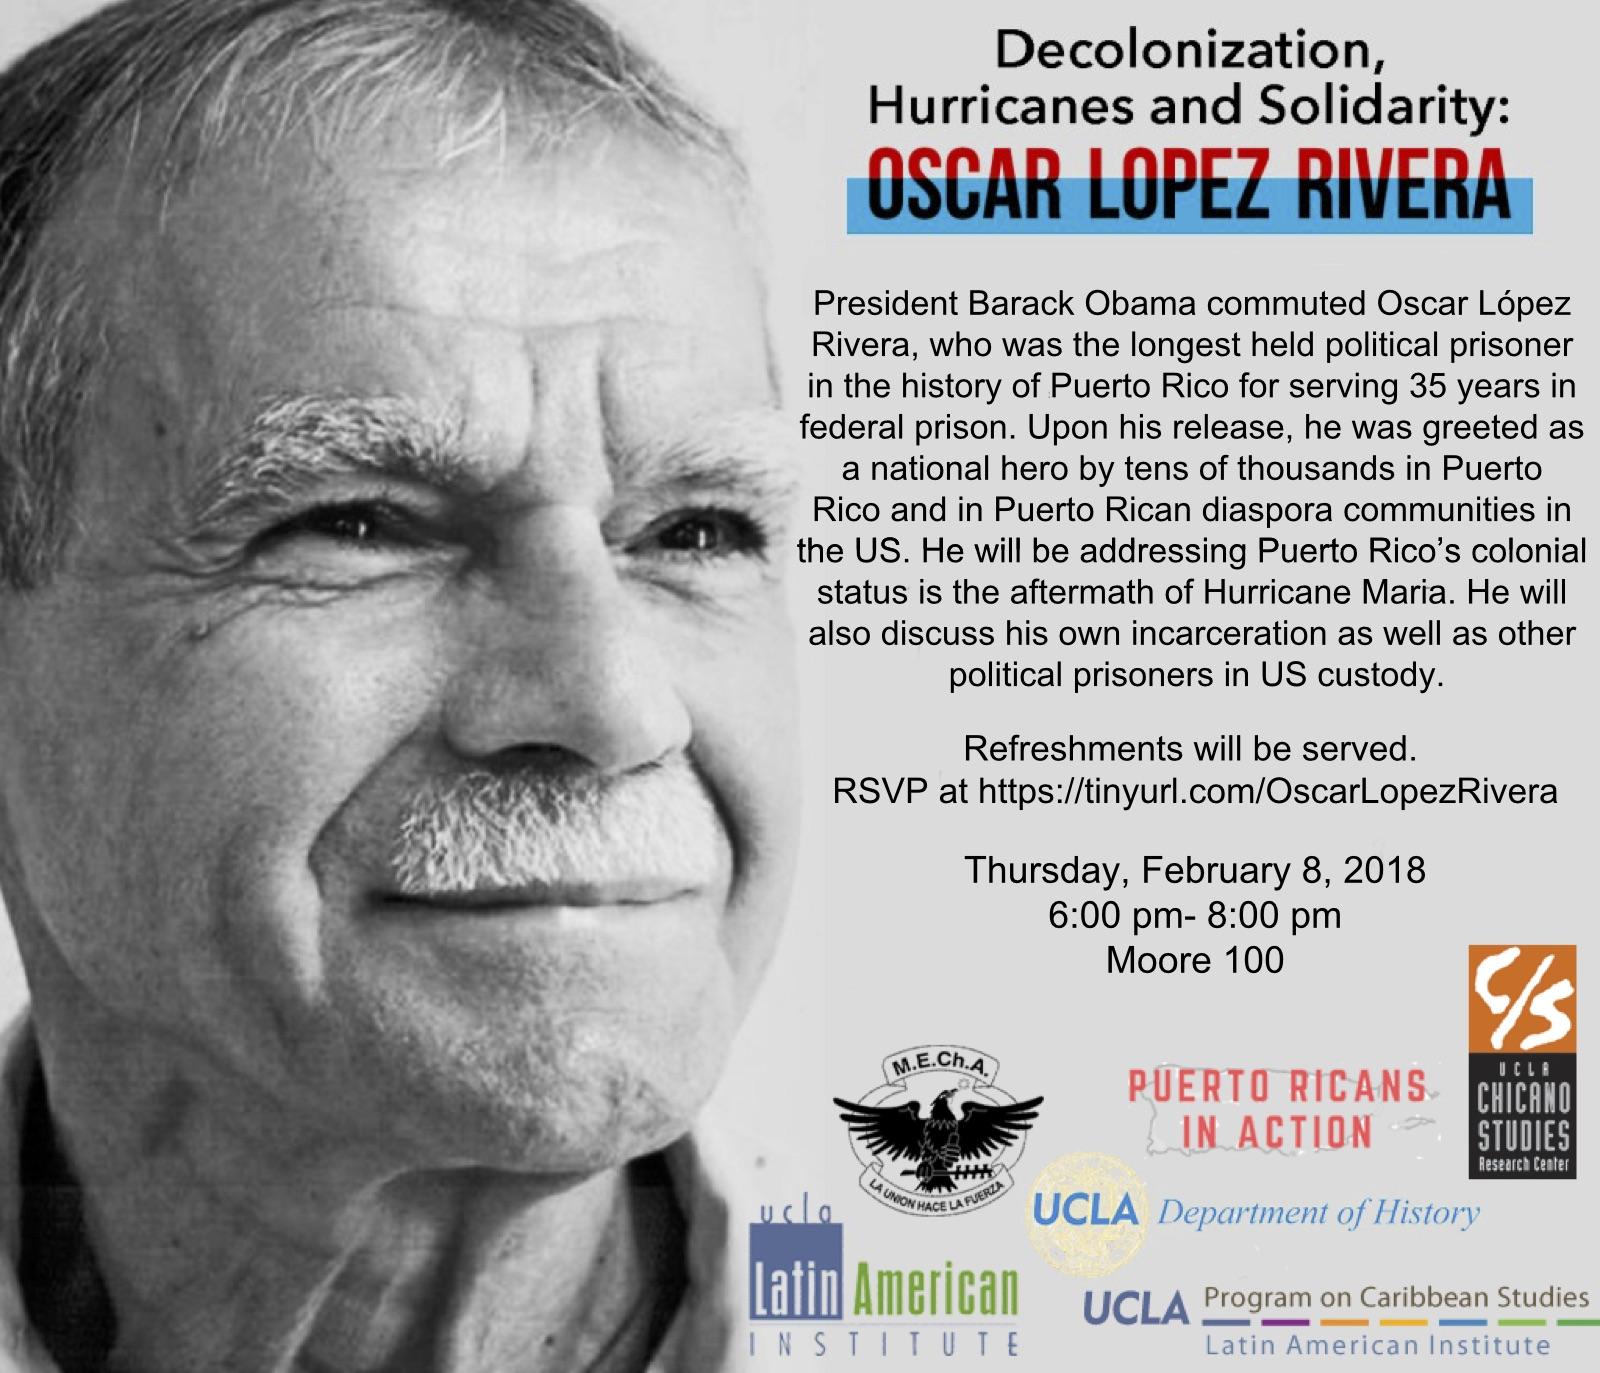 UCLA Oscar Lopez Rivera flyer.jpg